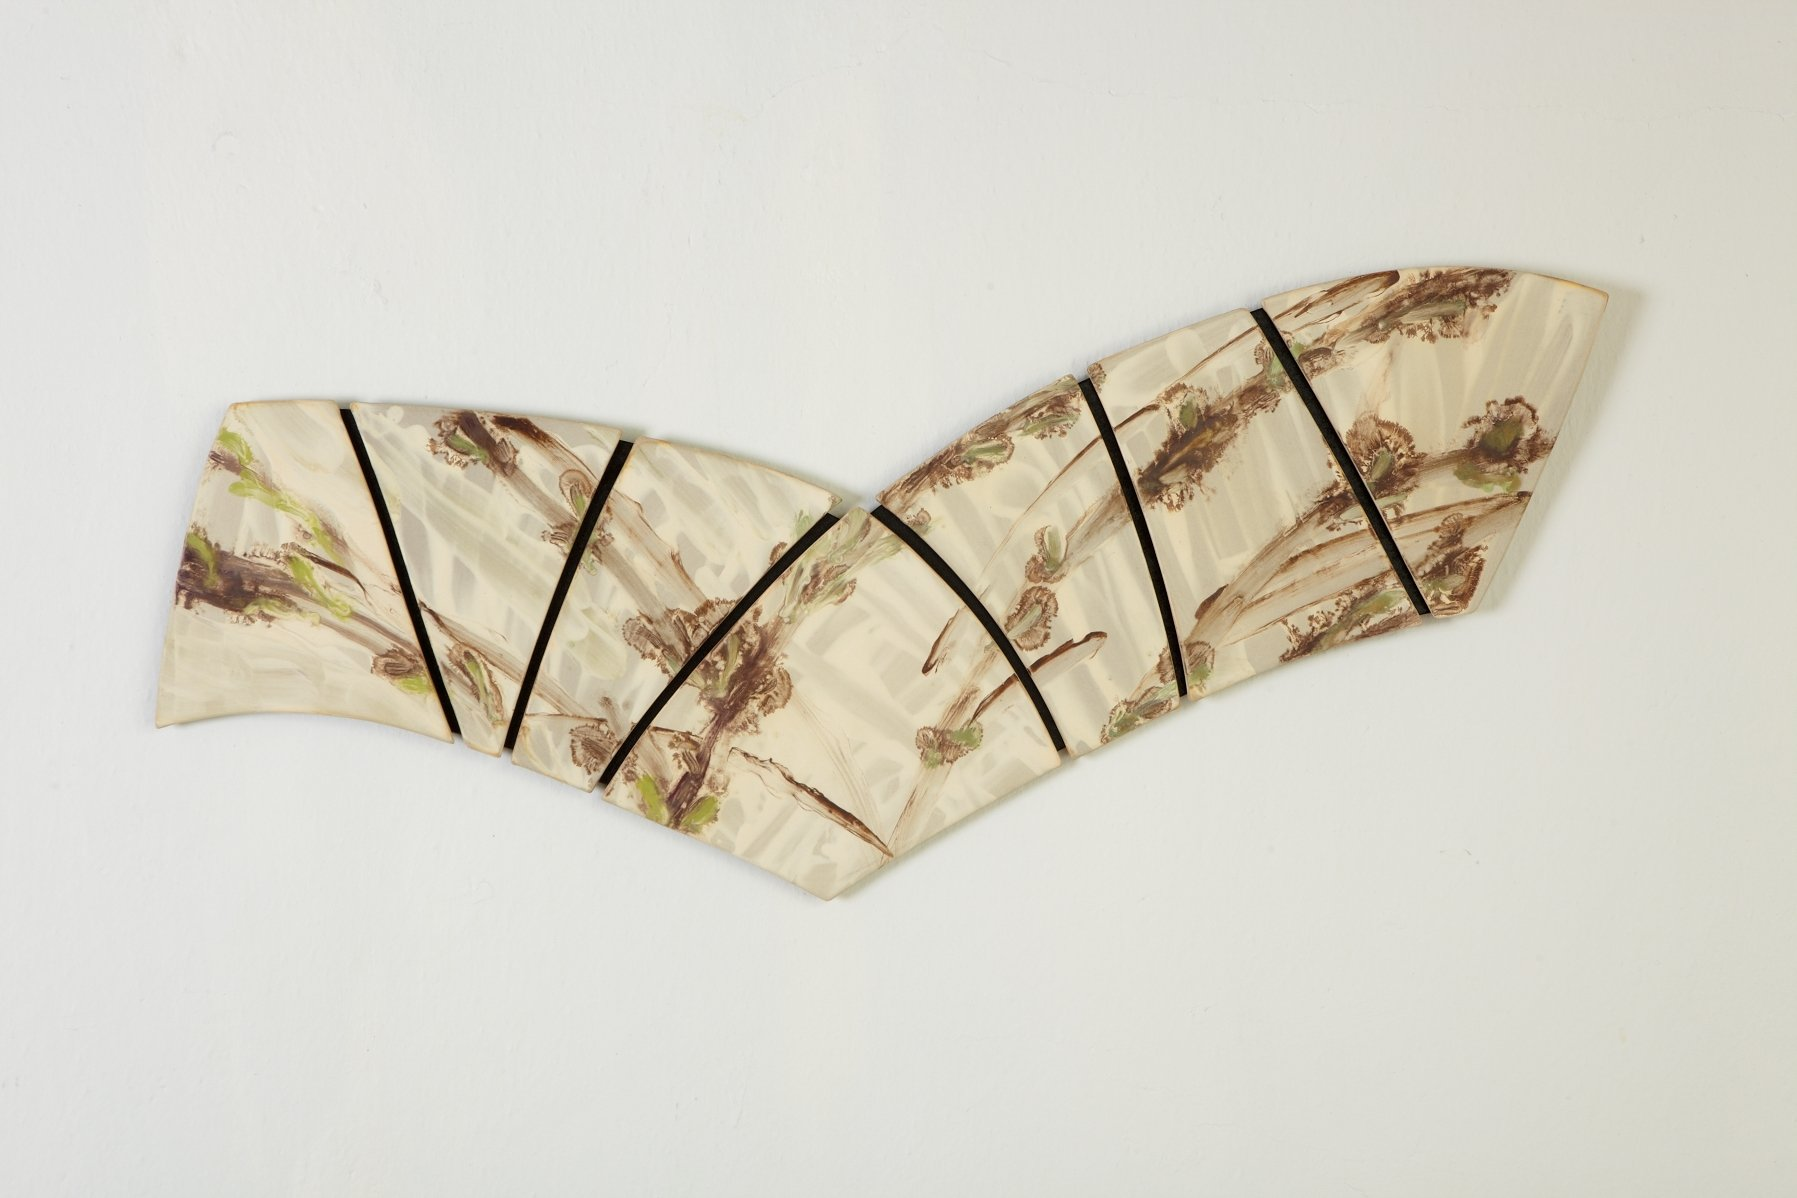 Wings by kristi sloniger ceramic wall art artful home for Ceramic wall art